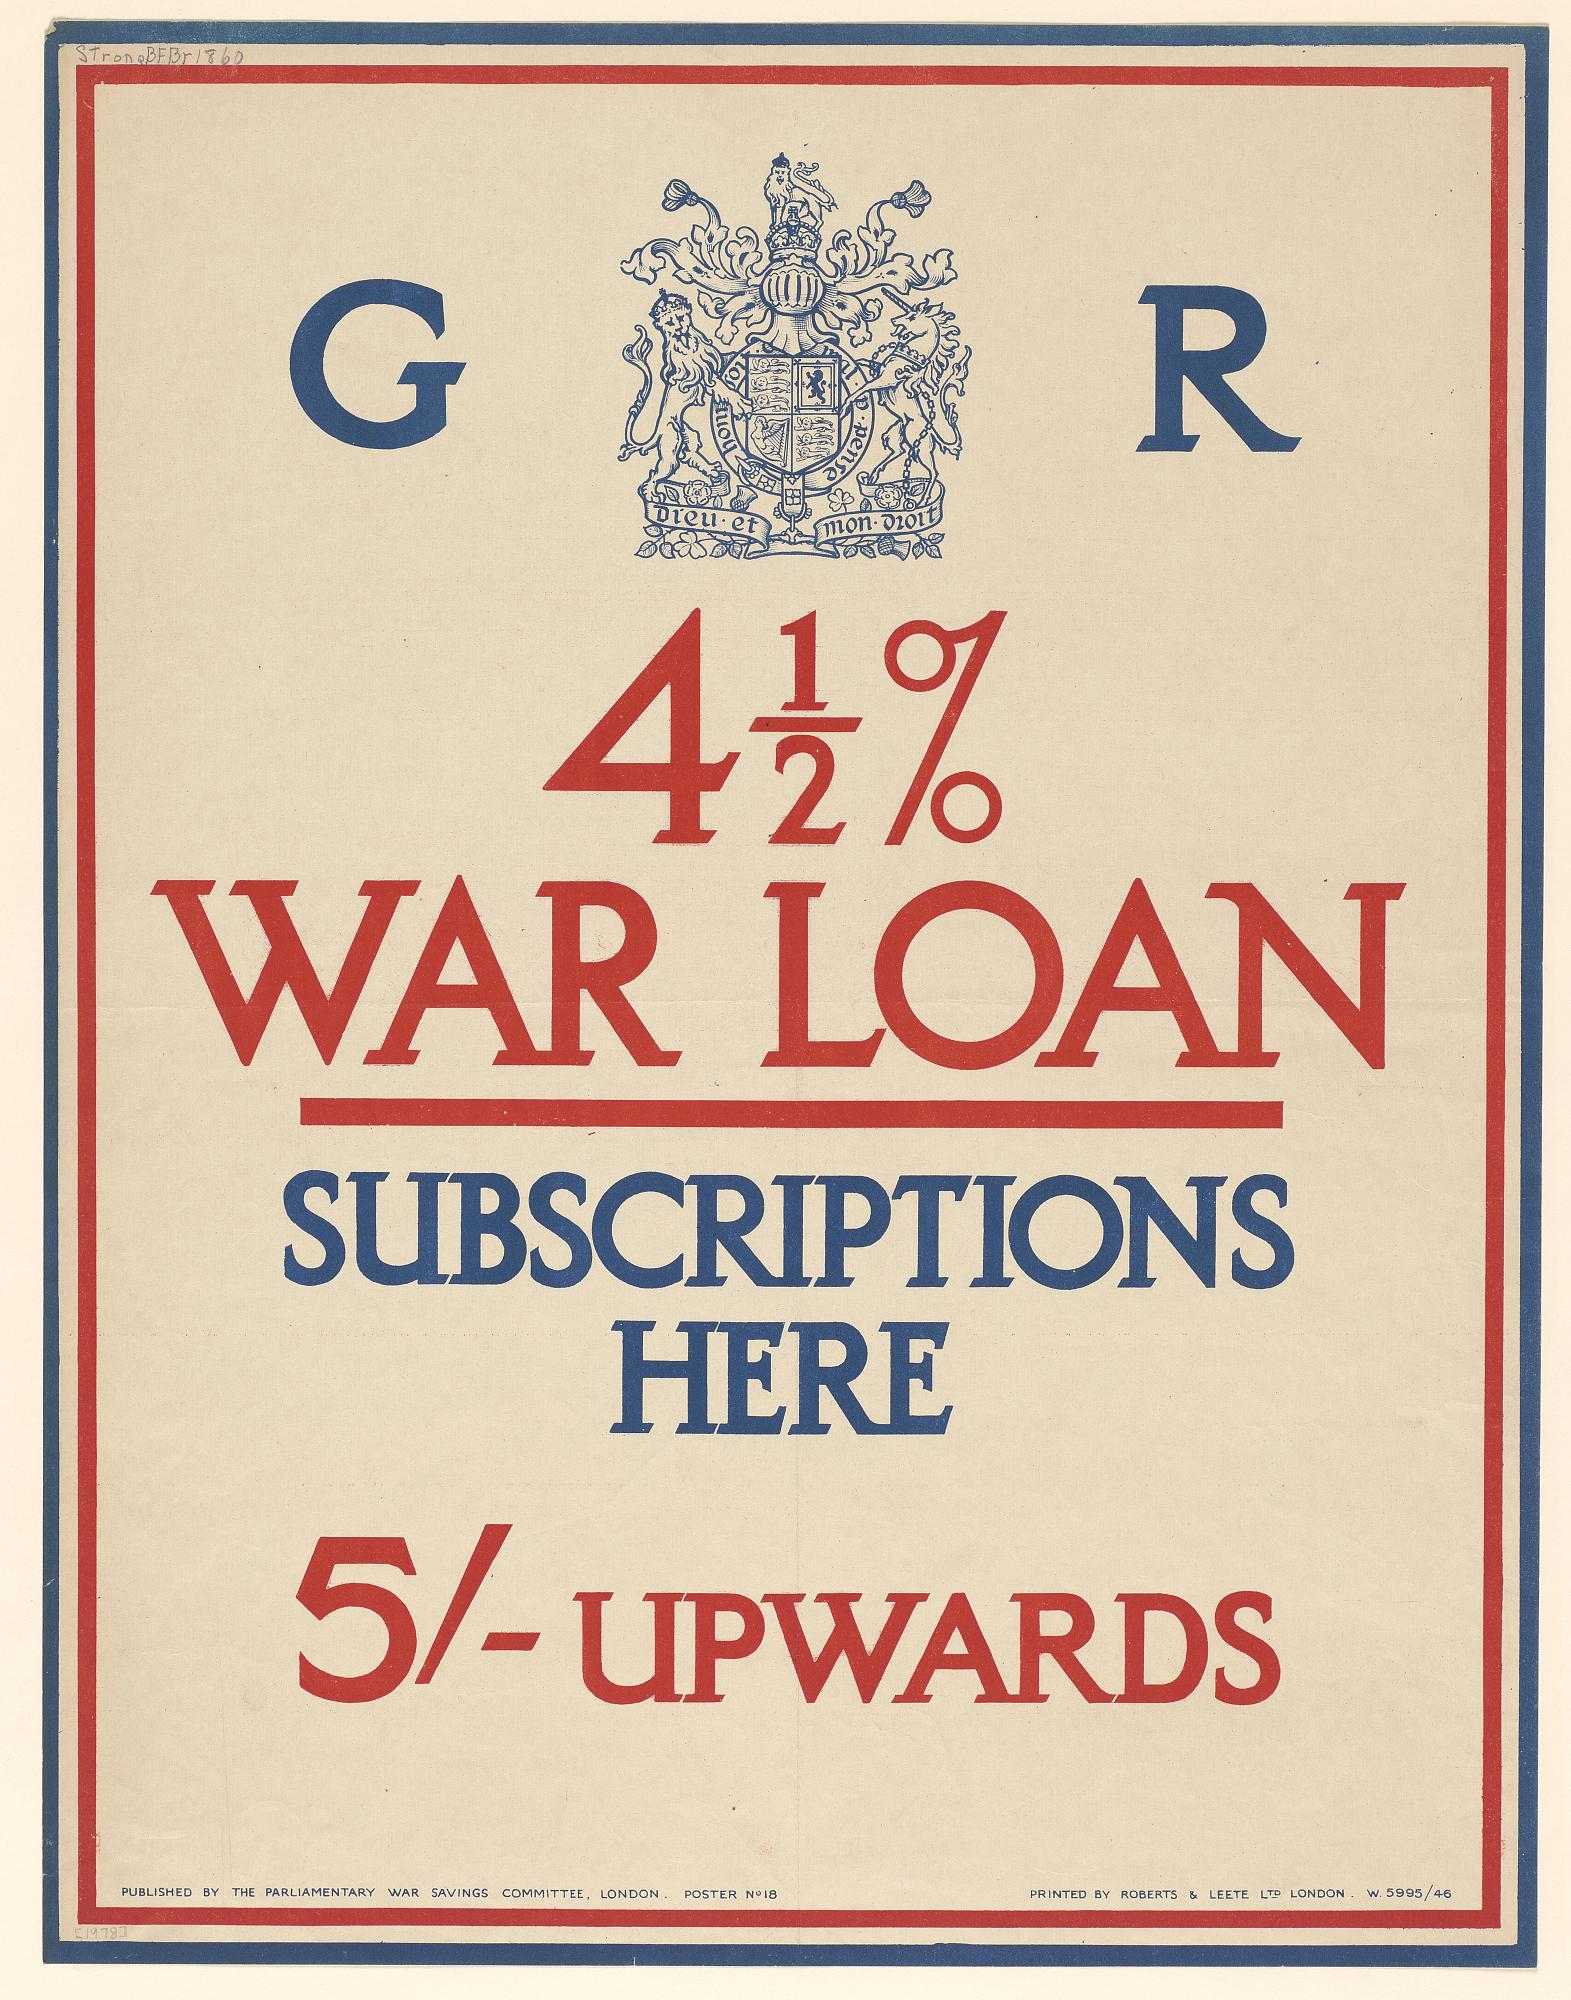 4 1/2% War Loan Subscriptions Here 5'- Upwards